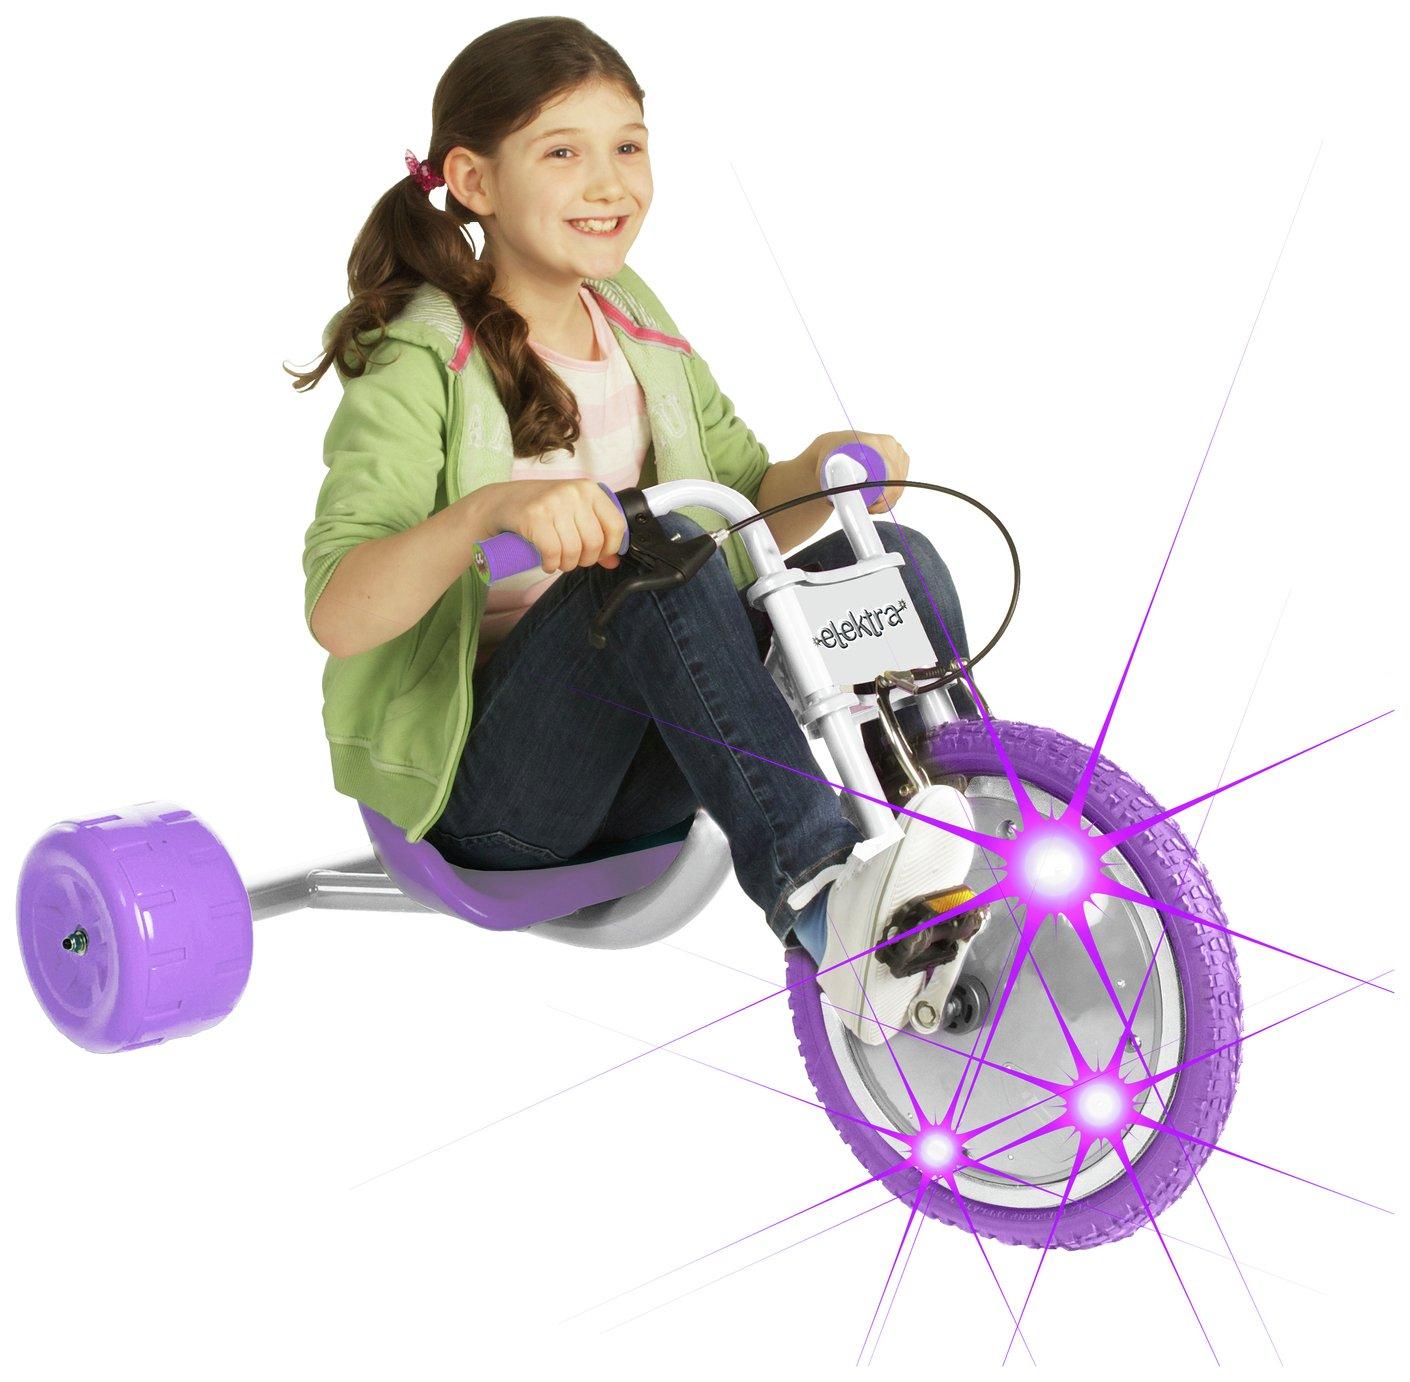 Elektra Flashing Hog Ride On Flashing Trike Go cart now £33 + £3.95 (limted locations) at Argos